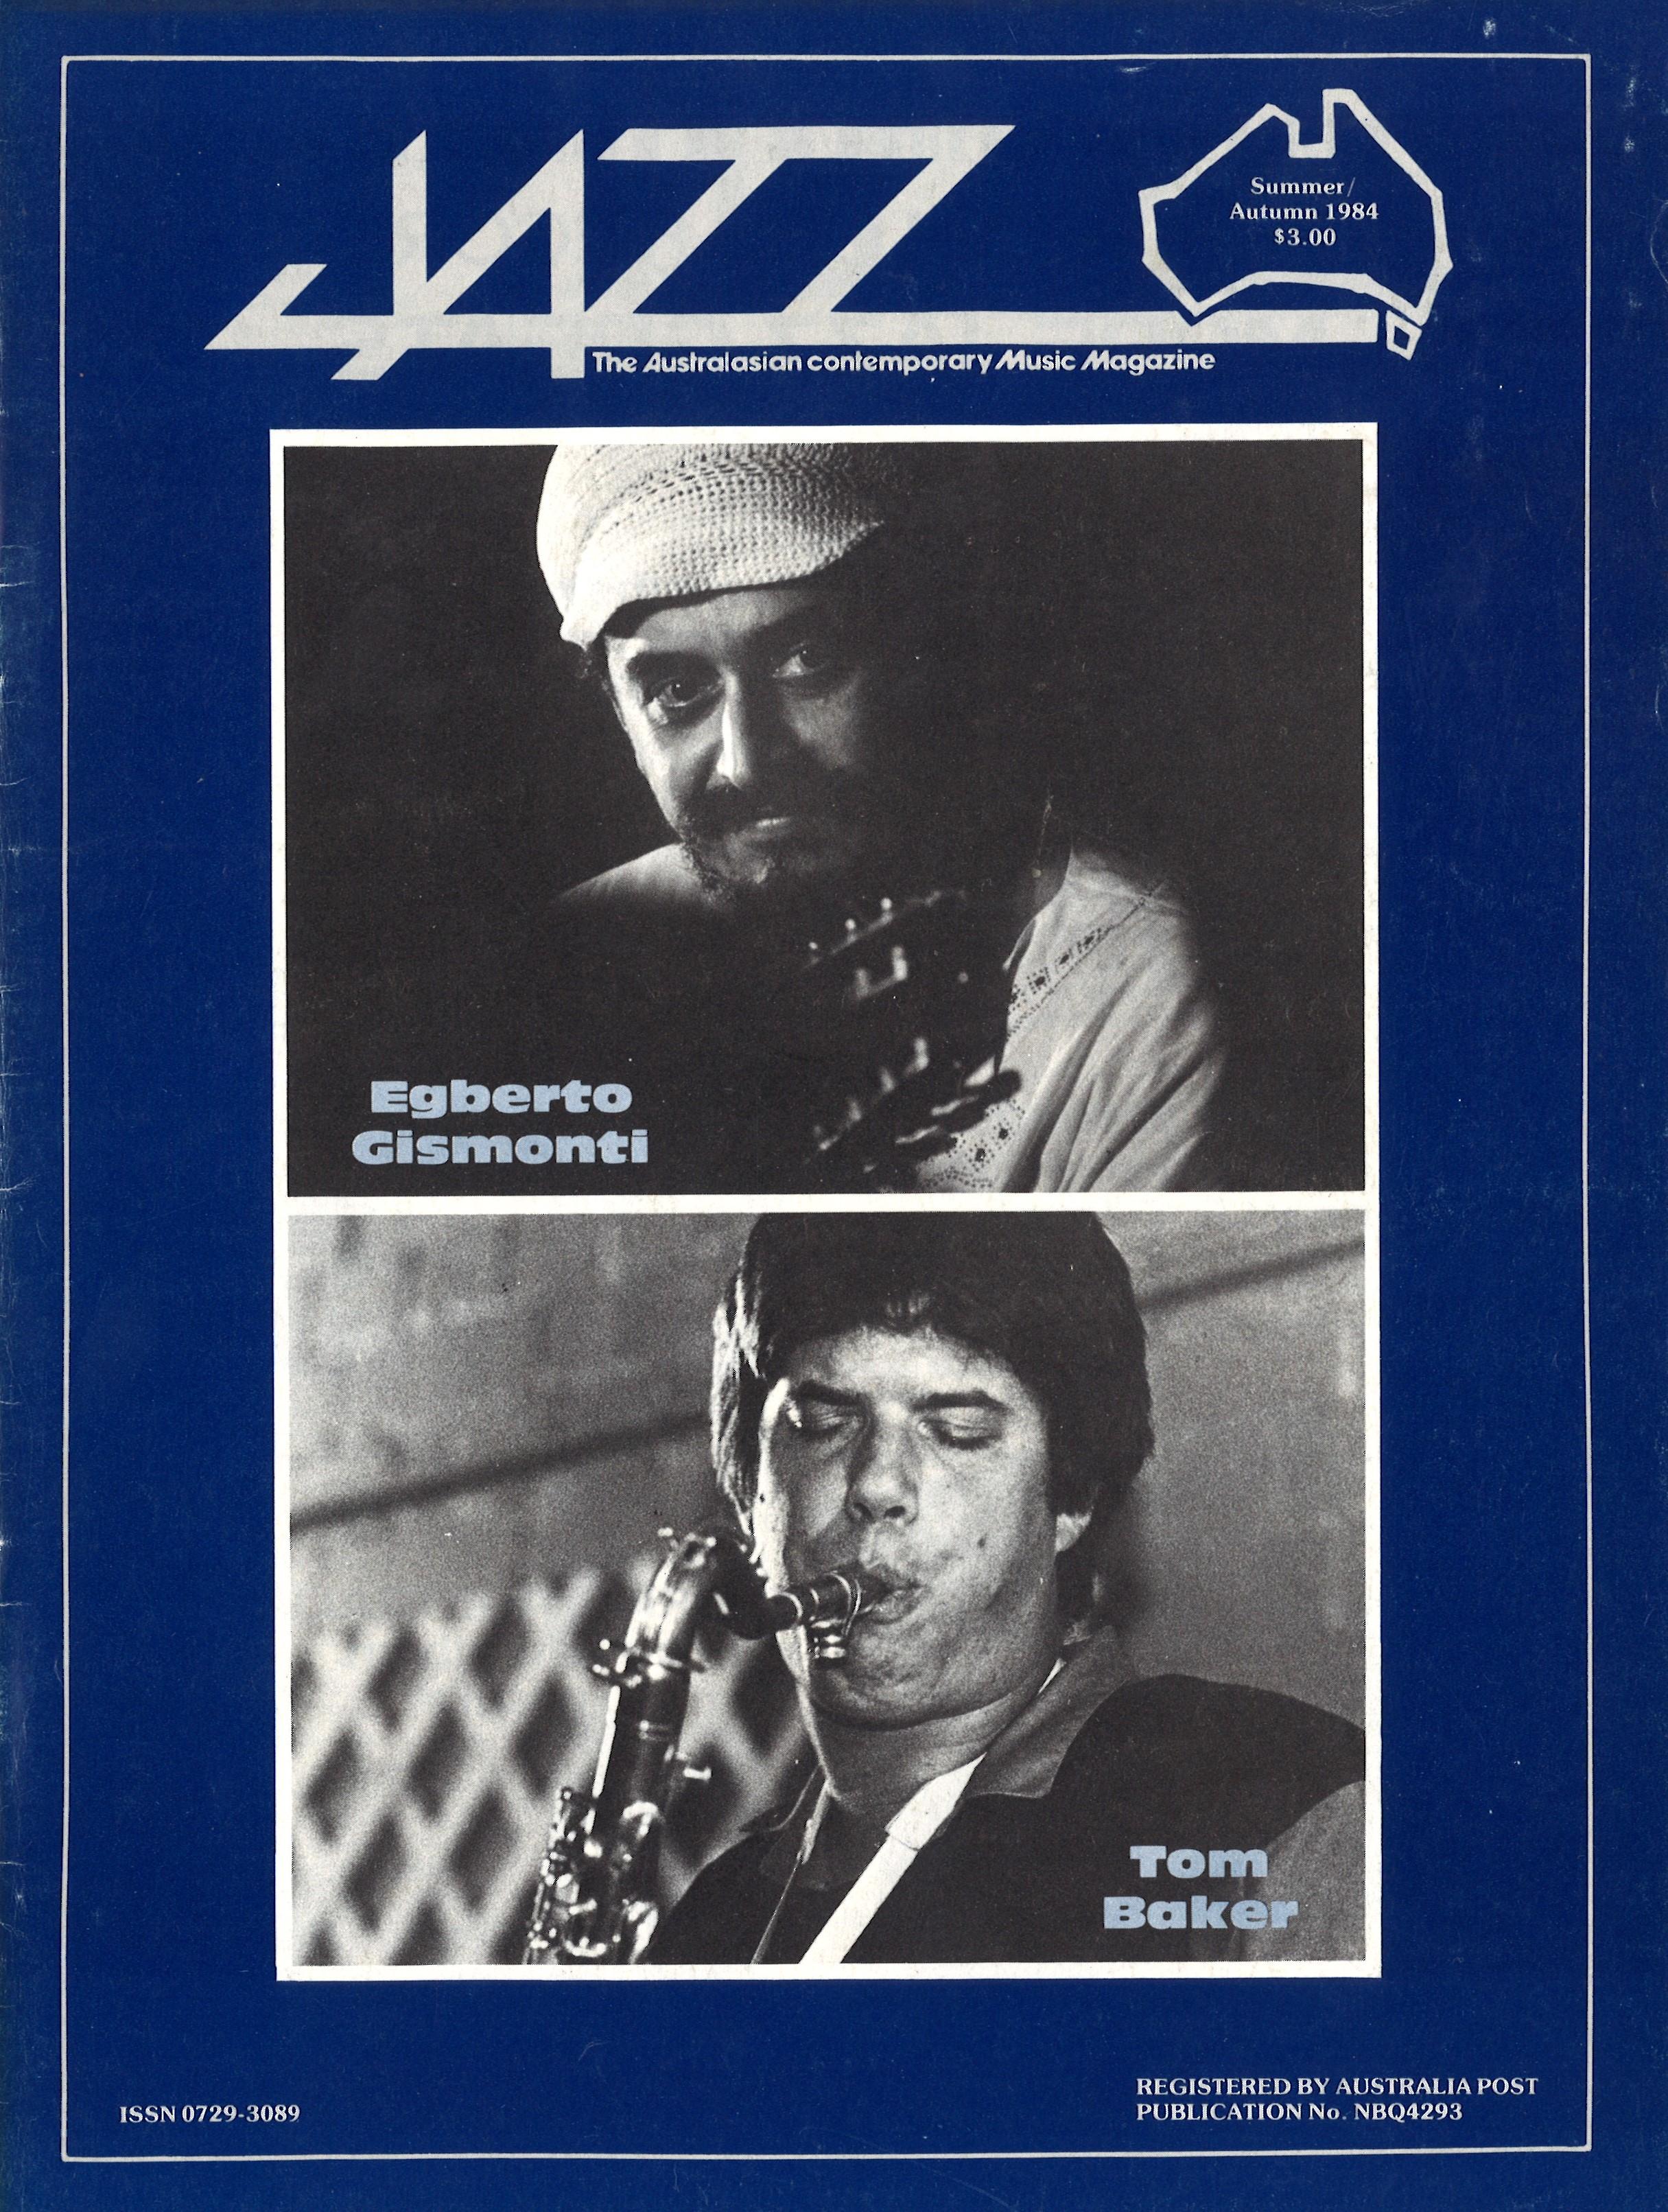 JazzMagazineSummerAutumn84FrontCover (2).jpg